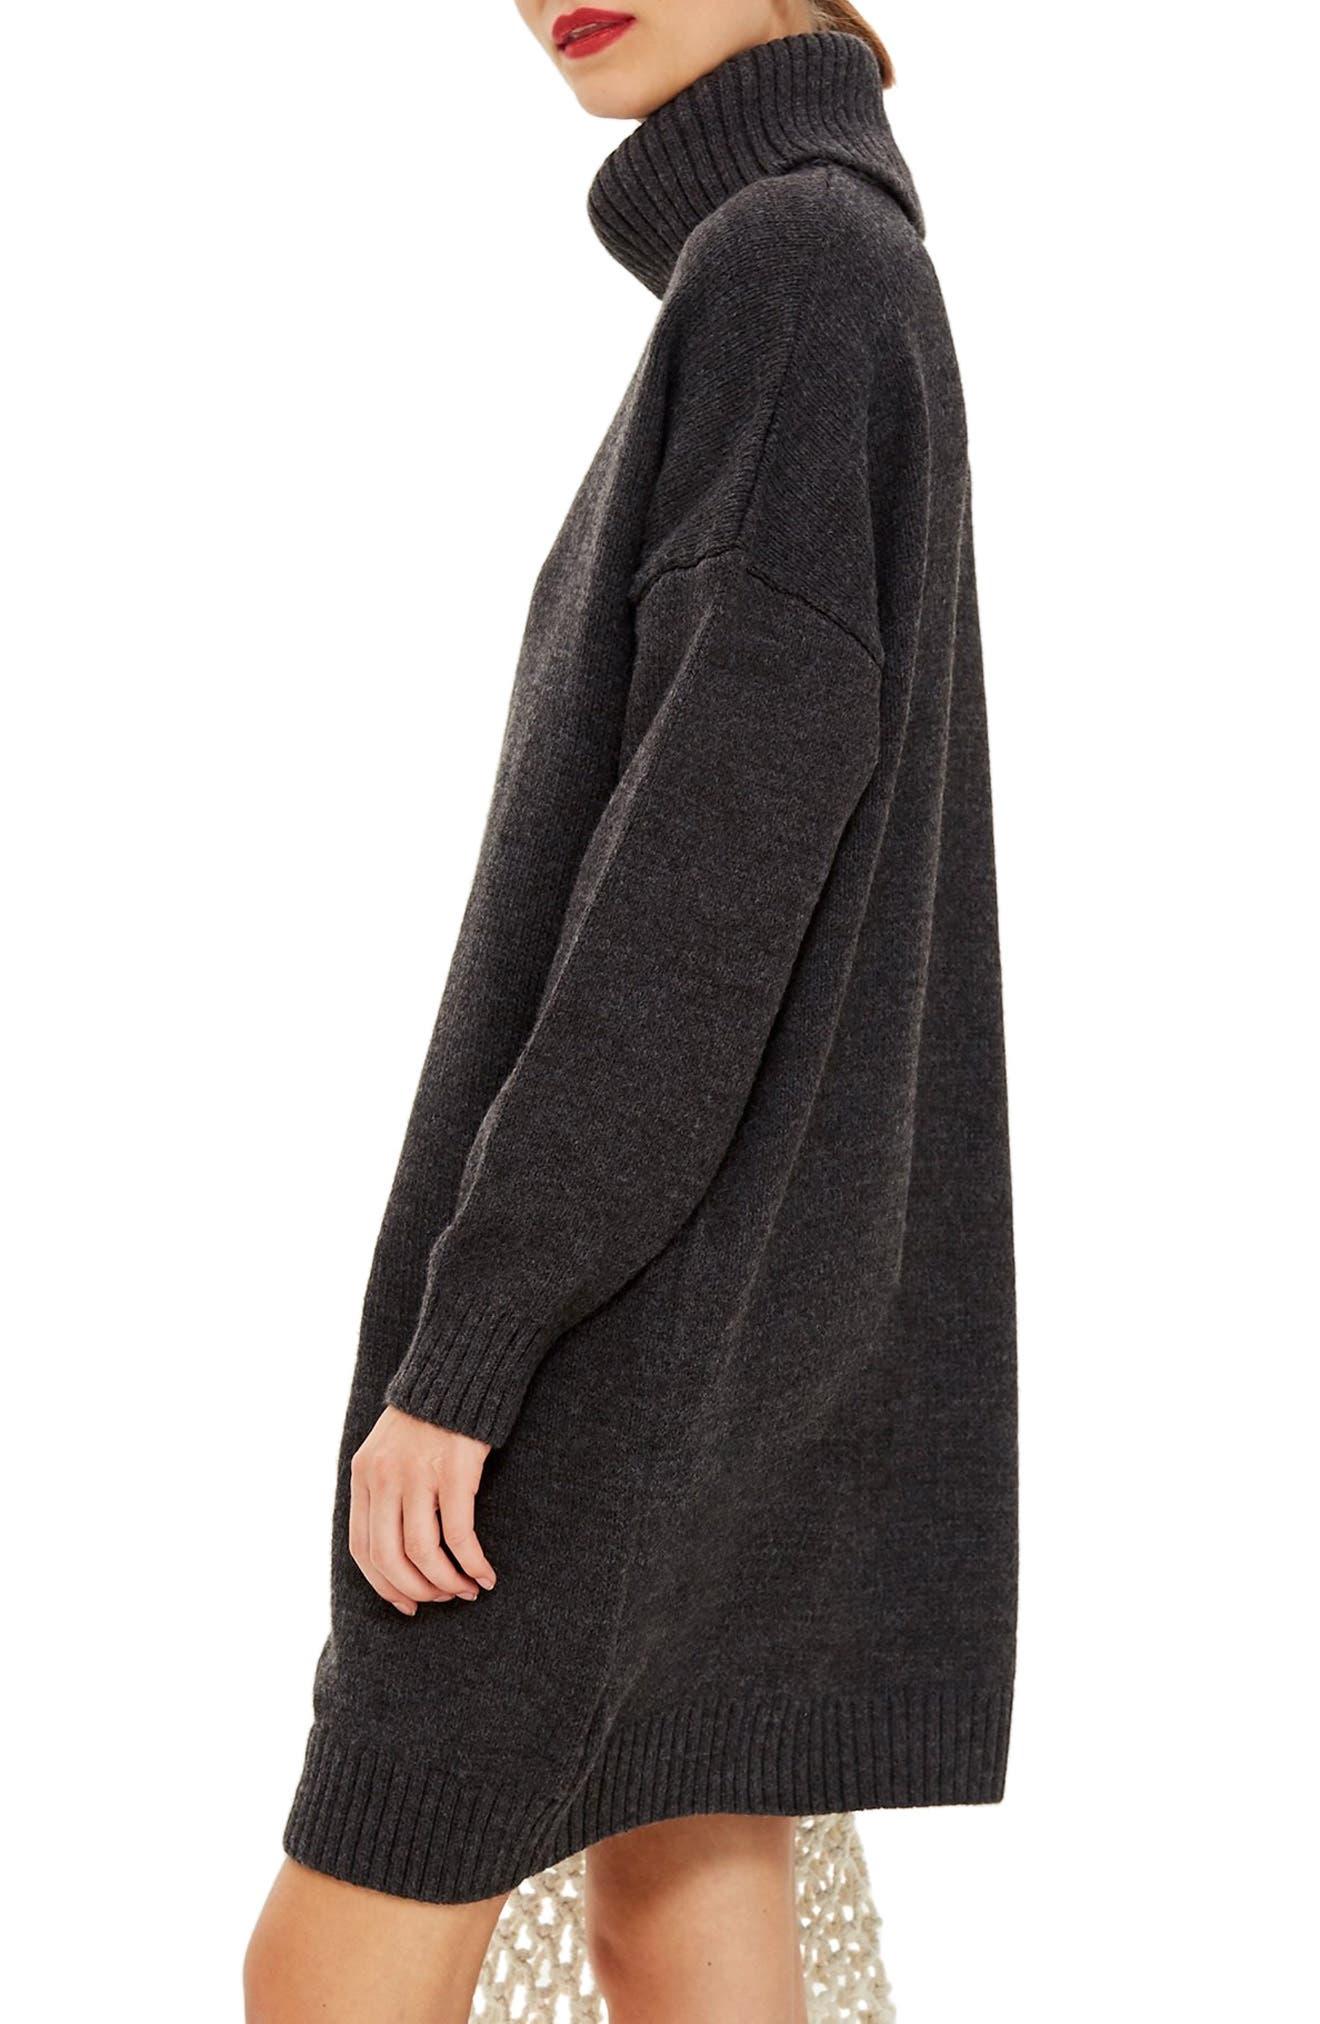 TOPSHOP, Turtleneck Sweater Dress, Alternate thumbnail 4, color, 021